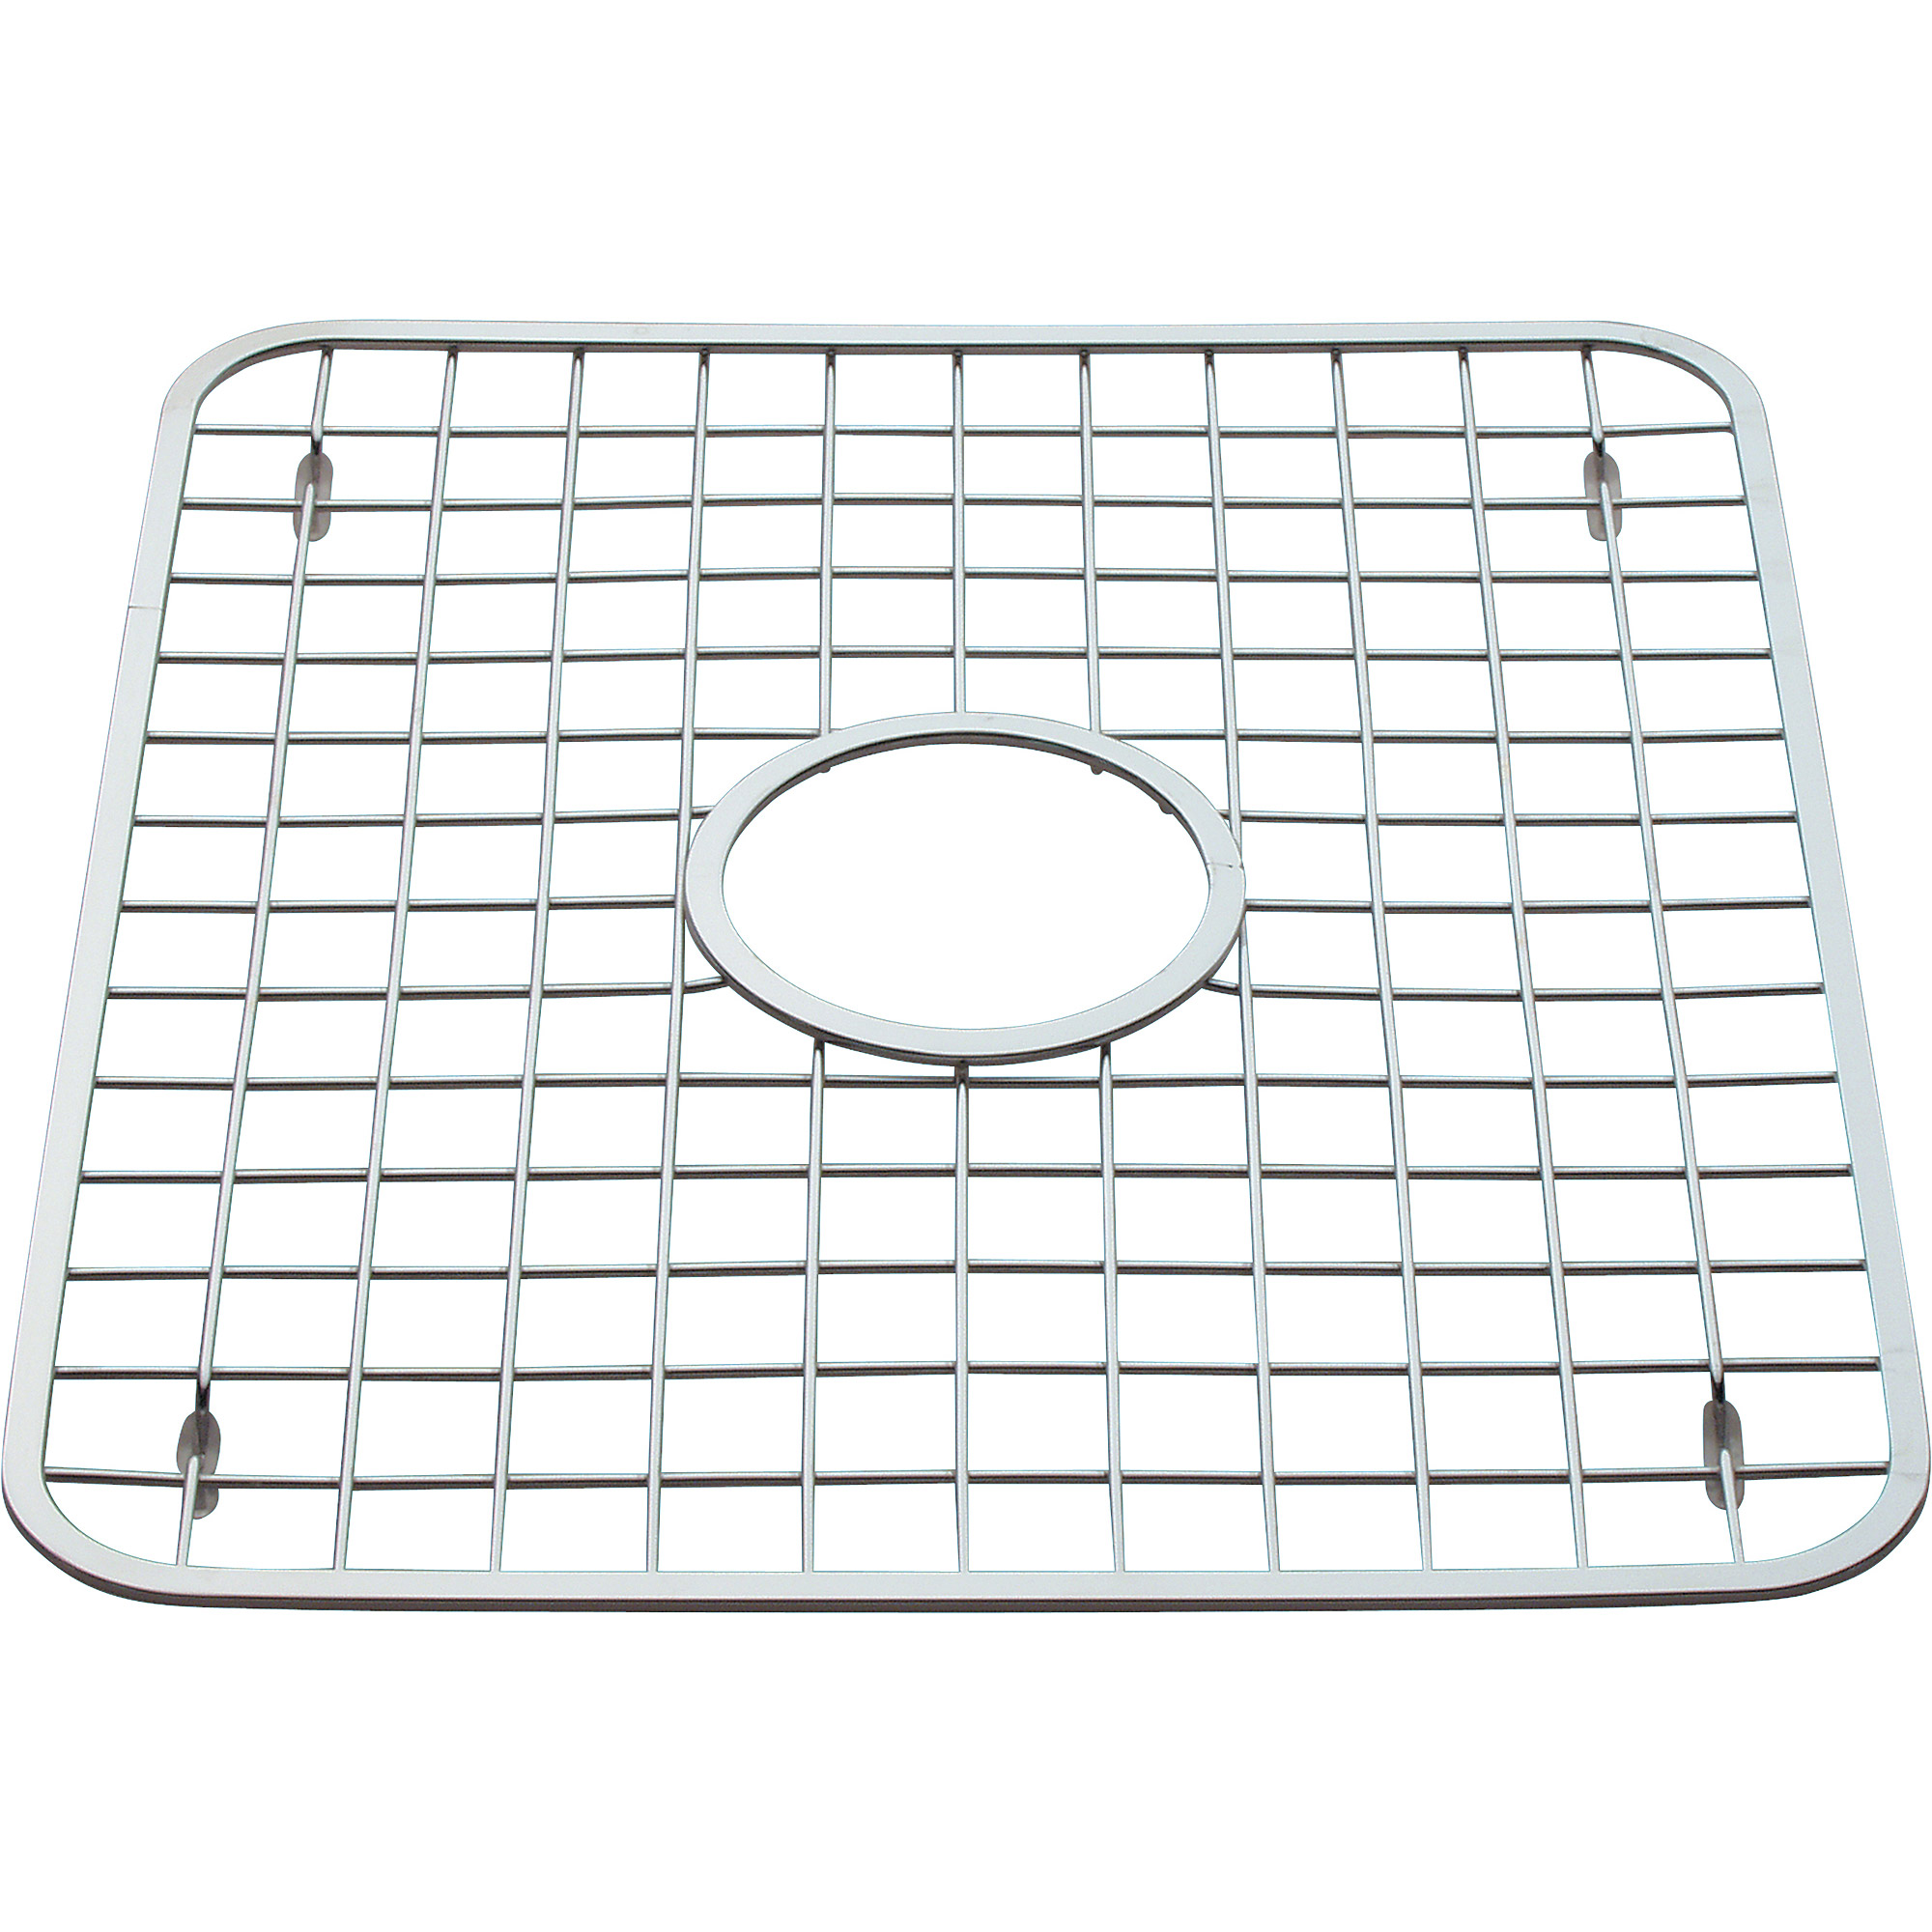 "InterDesign Sink Grid with Drain Hole, 12.75"" x 11"""